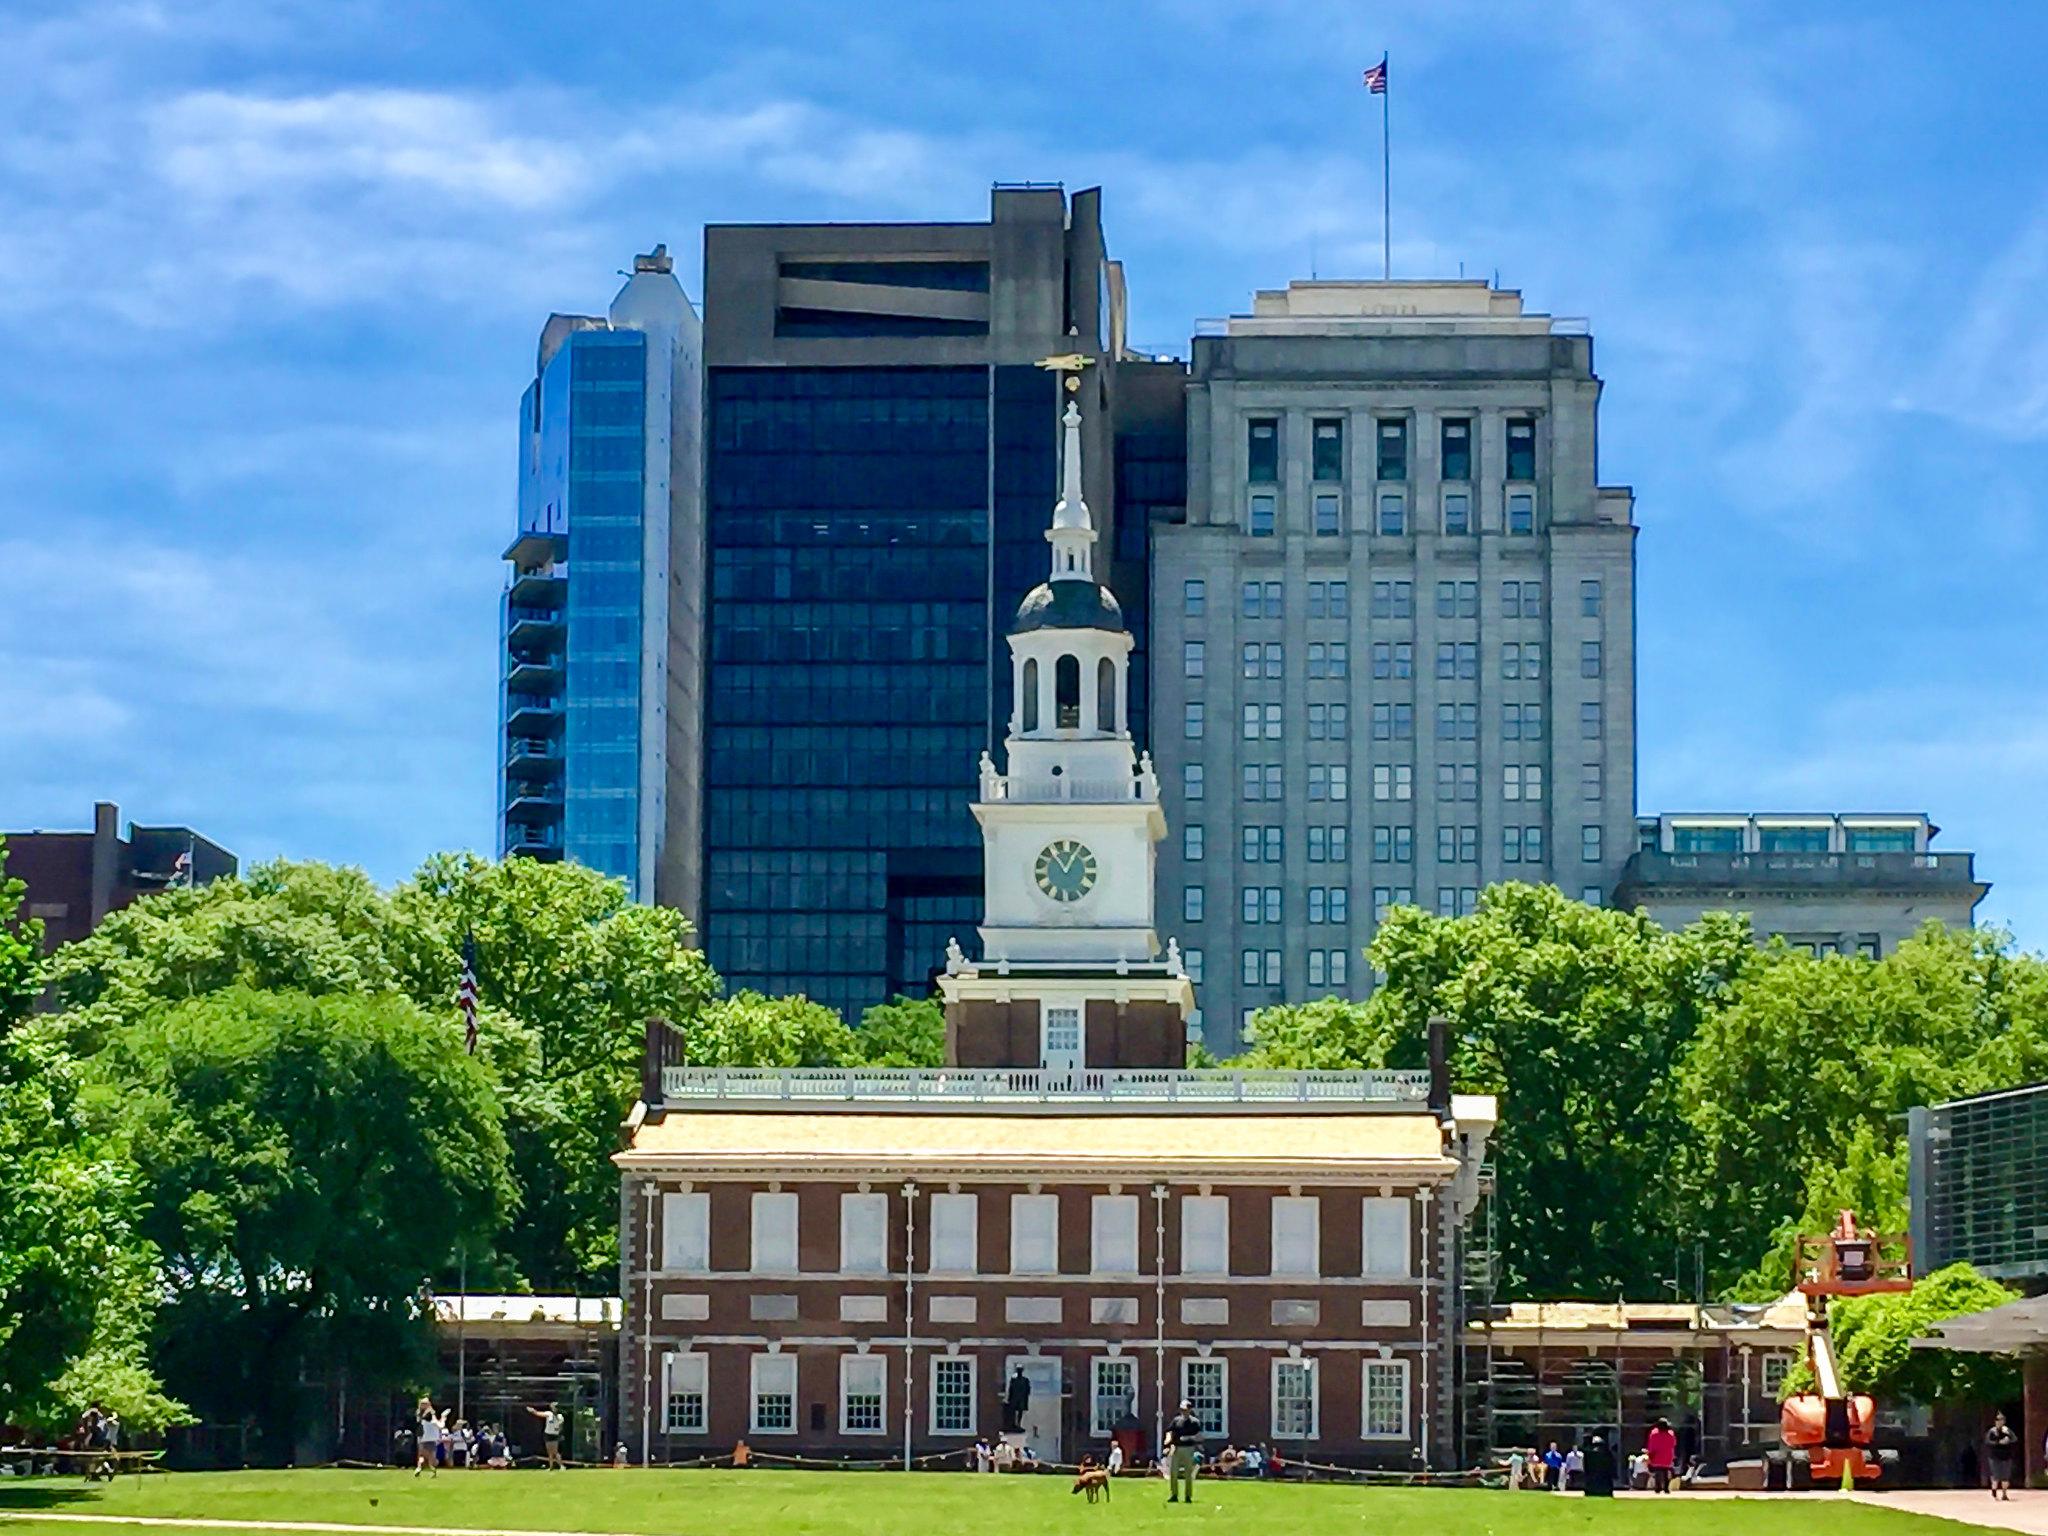 Philadelphie - Pennsylvanie - [USA]